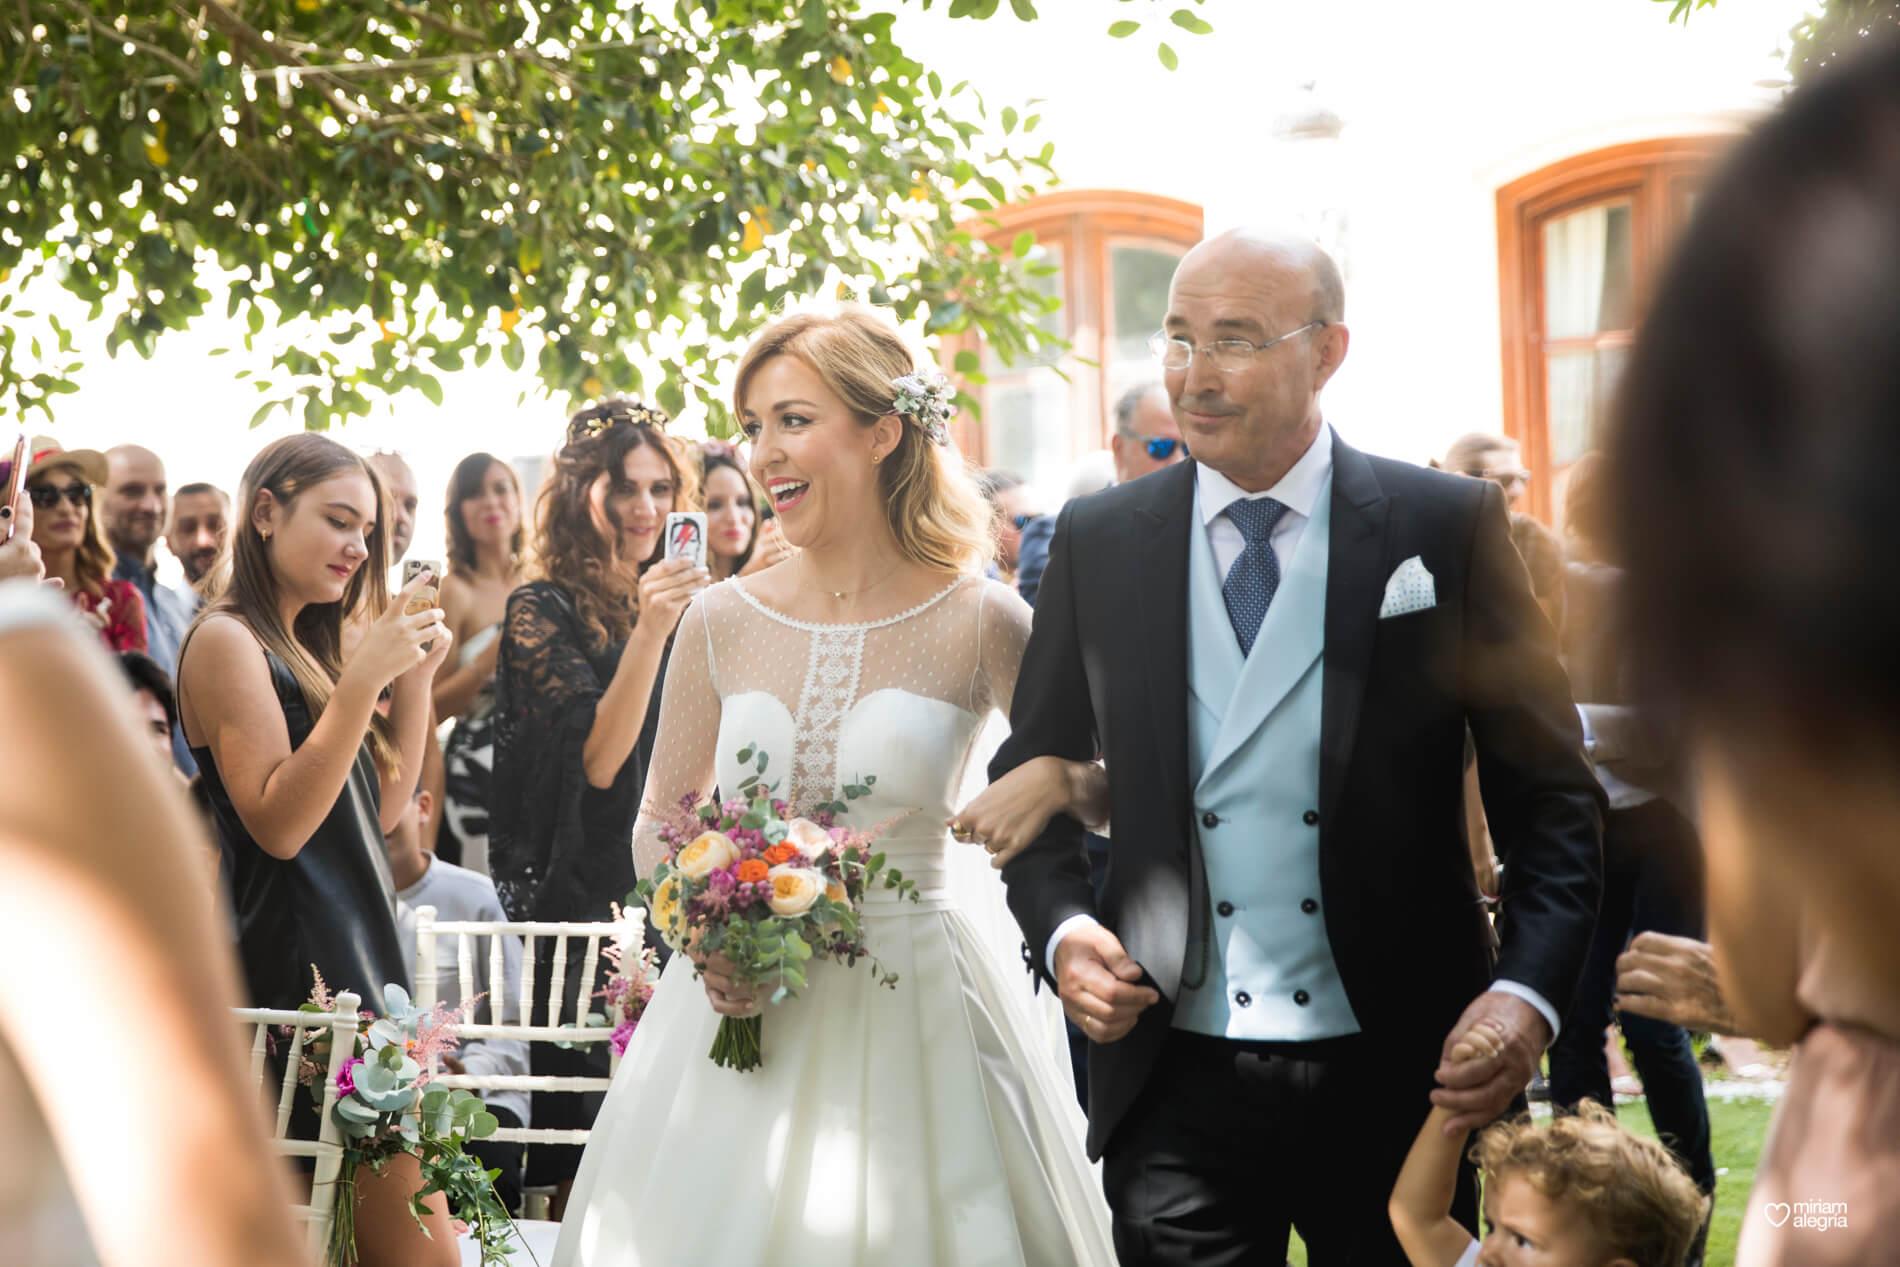 la-boda-de-alemc7-miriam-alegria-fotografos-boda-murcia-42